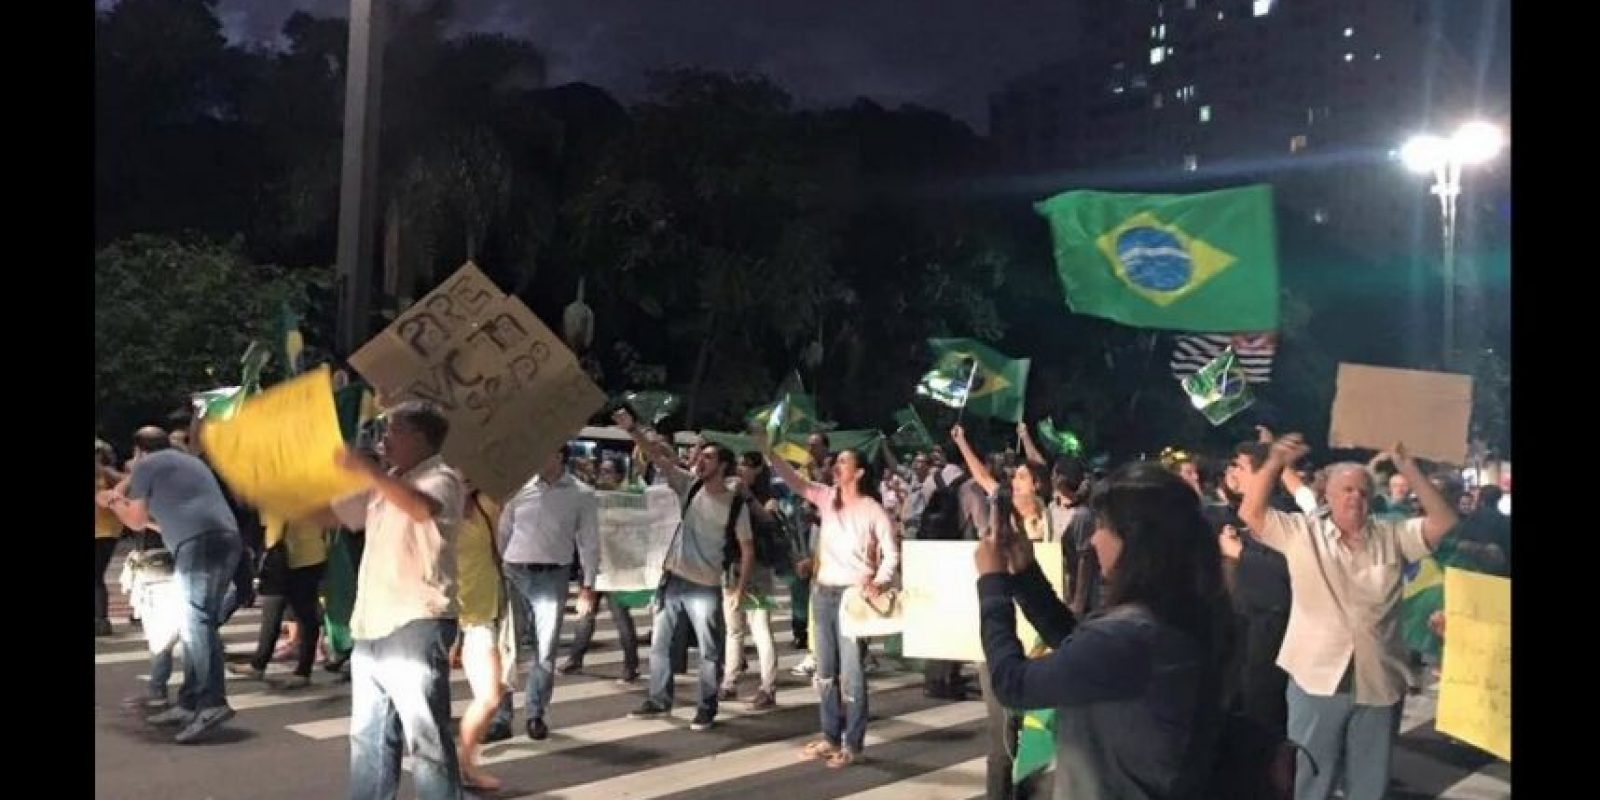 Muchos de ellos salieron a manifestarse. Foto:Vía Twitter @amigoperu76